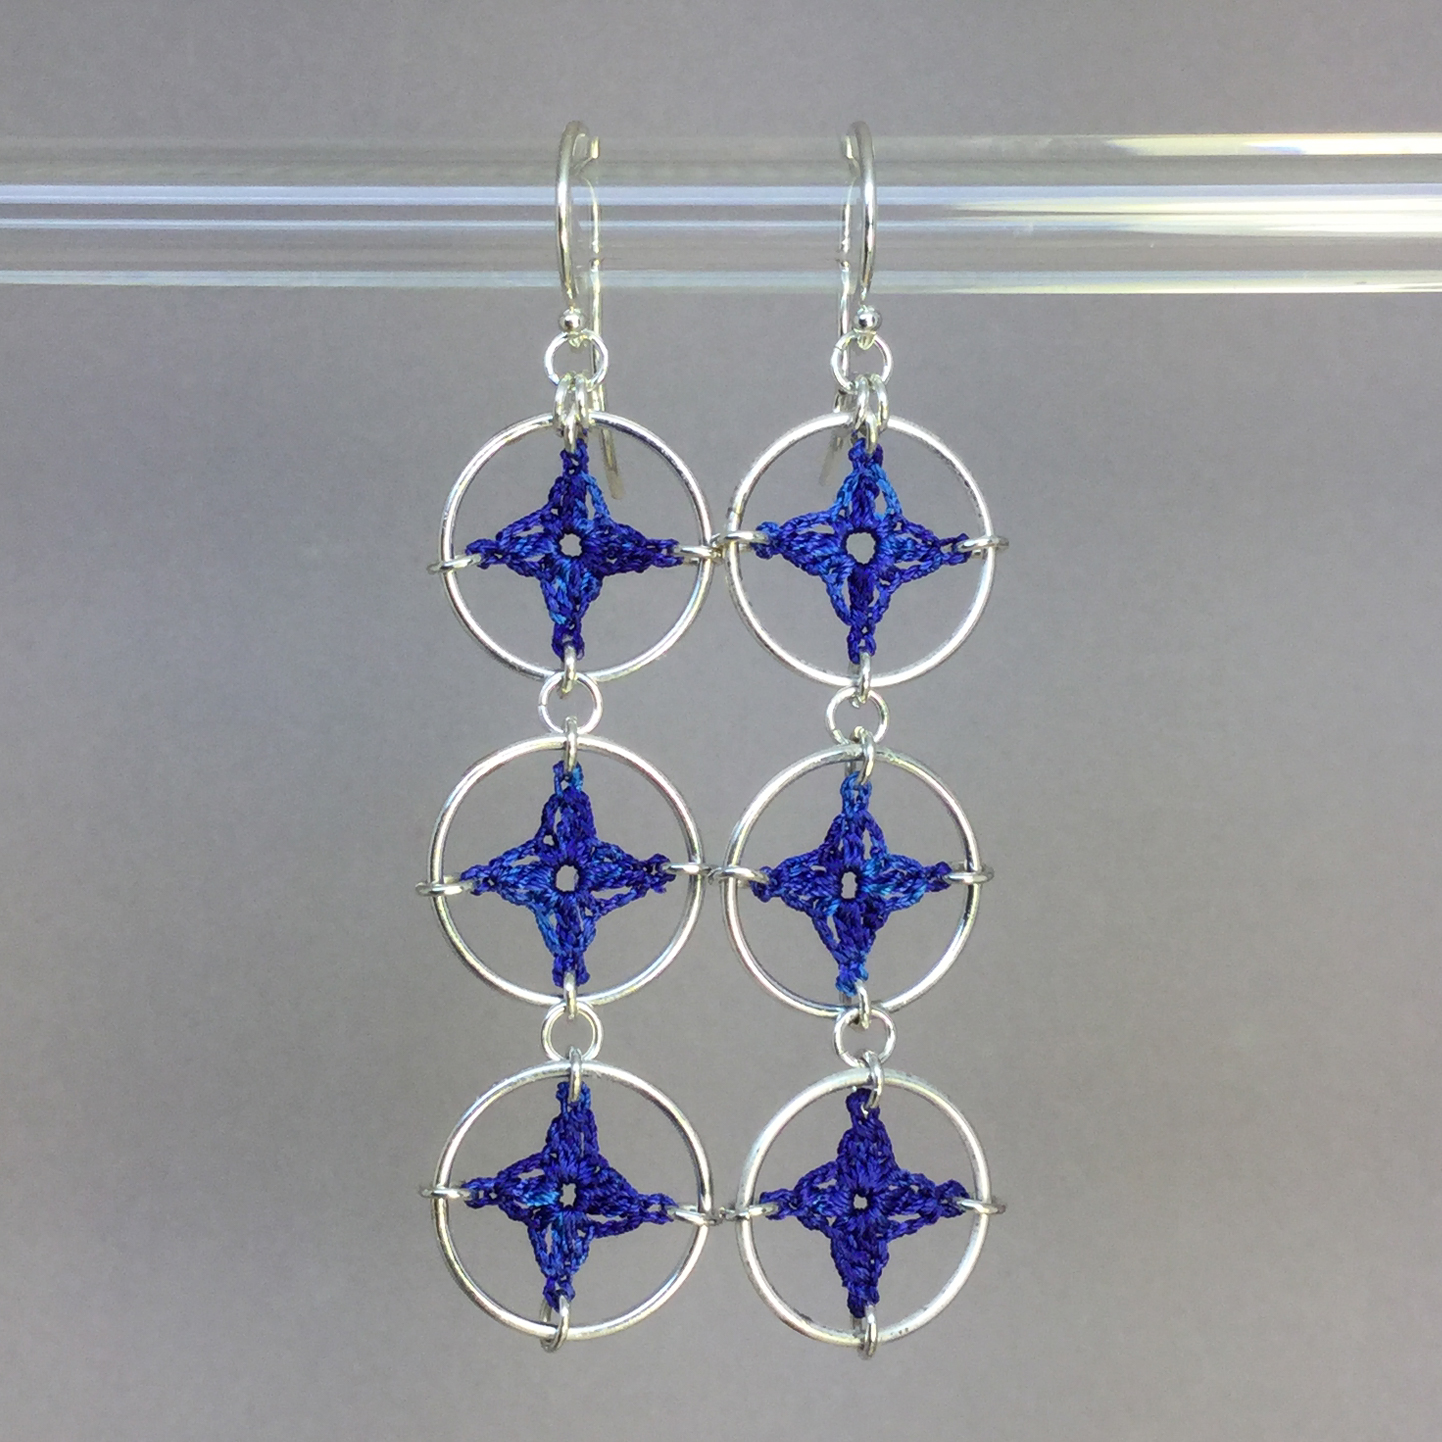 Spangles 3 earrings, silver, blue